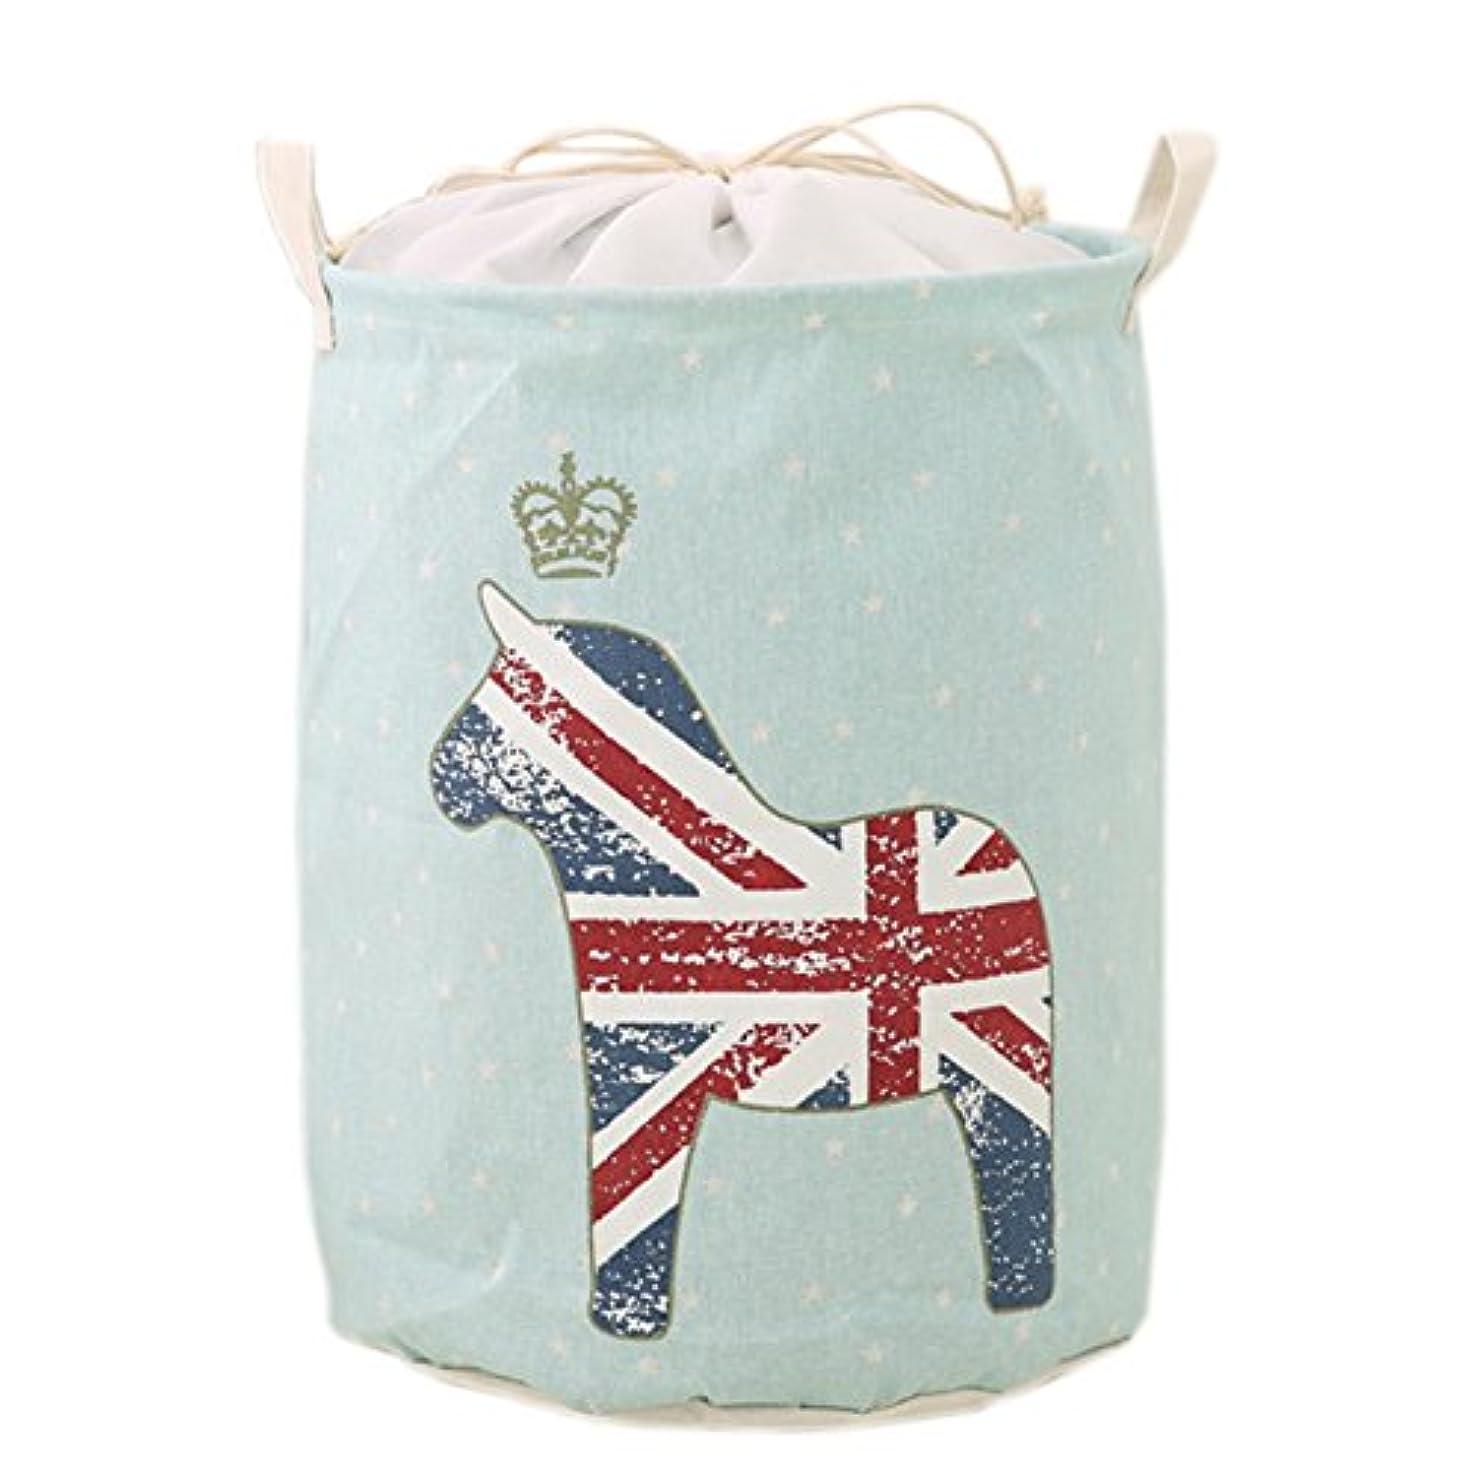 Soaptree Drawstring Canvas Laundry Basket,Large Foldable Washing Bins,Dustproof Toys Organizers and Storage Bags